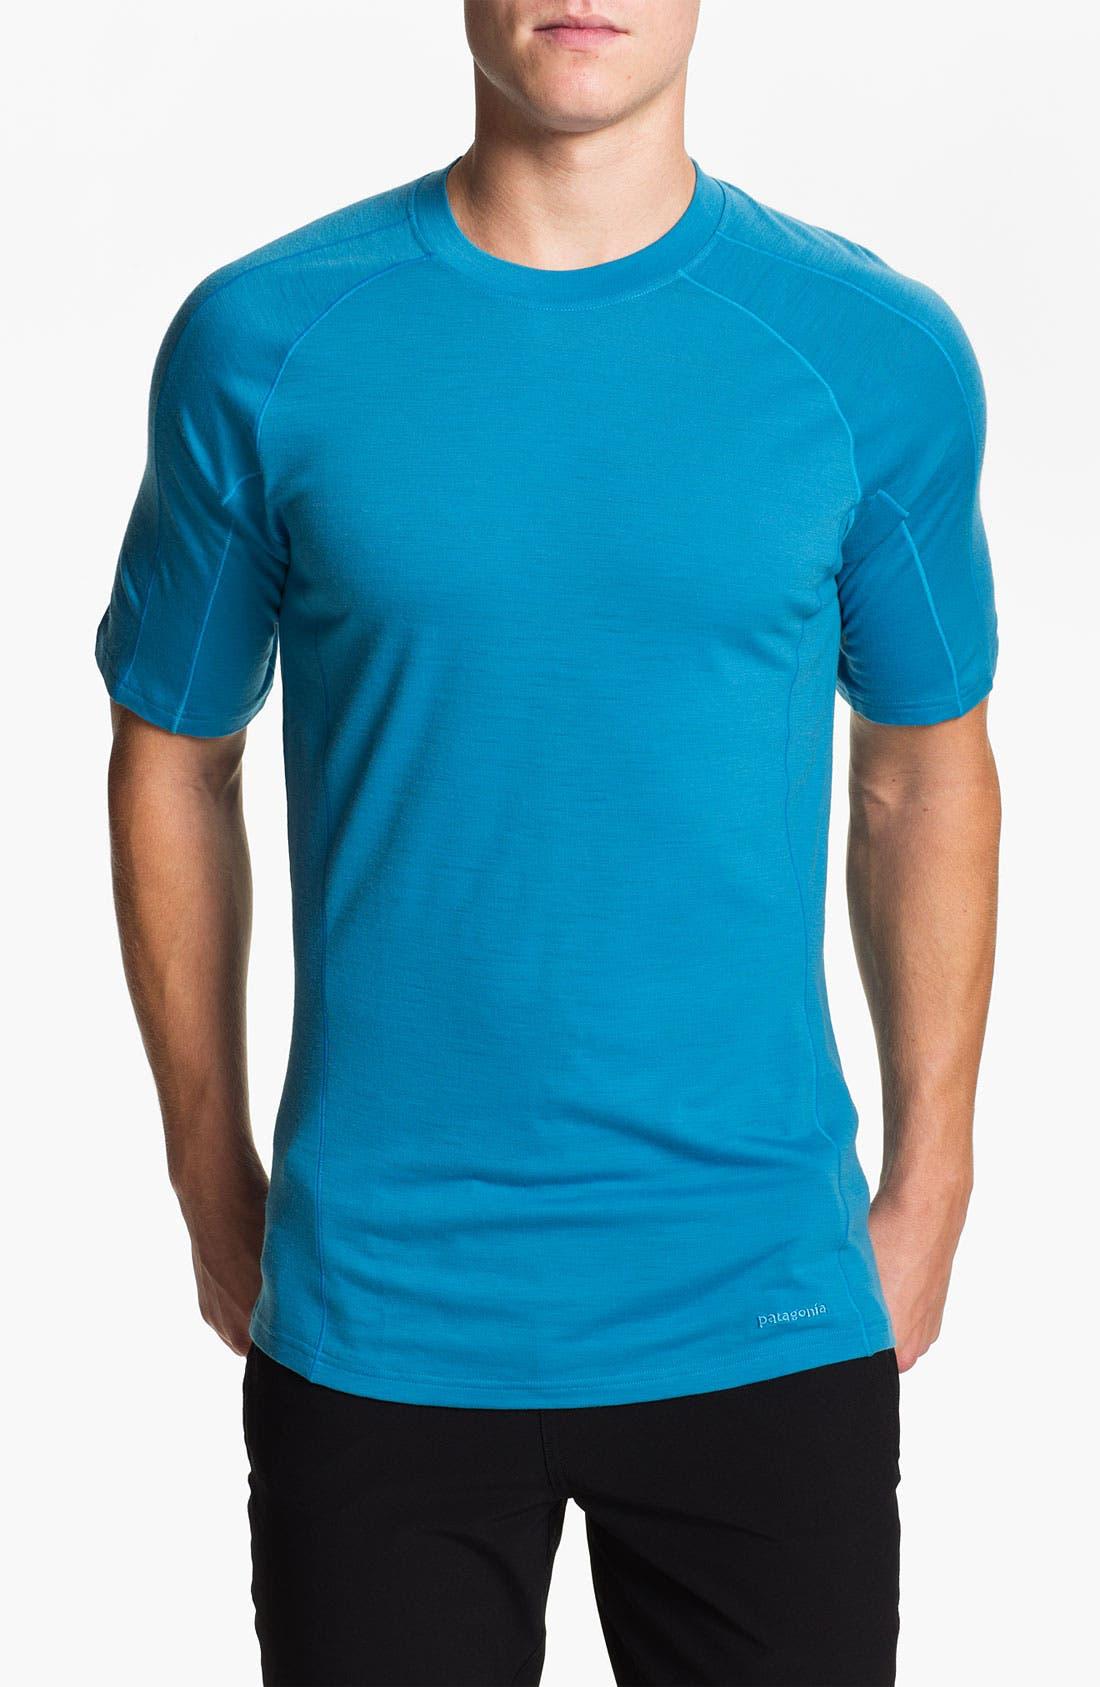 Alternate Image 1 Selected - Patagonia 'Merino 2' T-Shirt